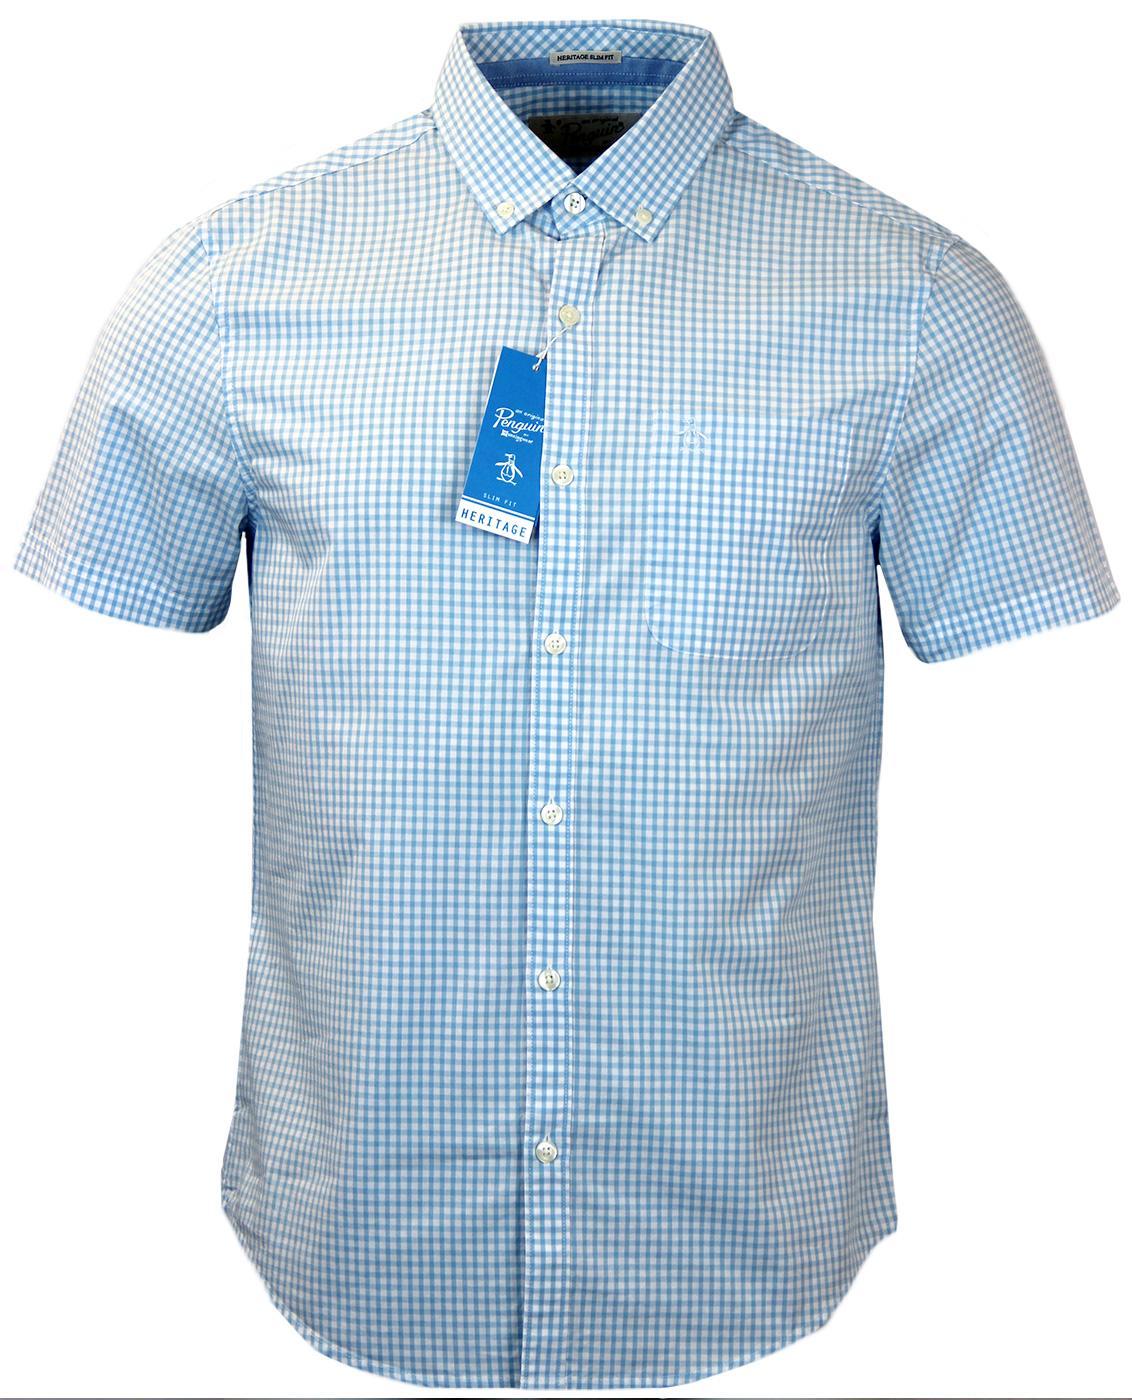 Belan ORIGINAL PENGUIN Retro Mod Gingham Shirt